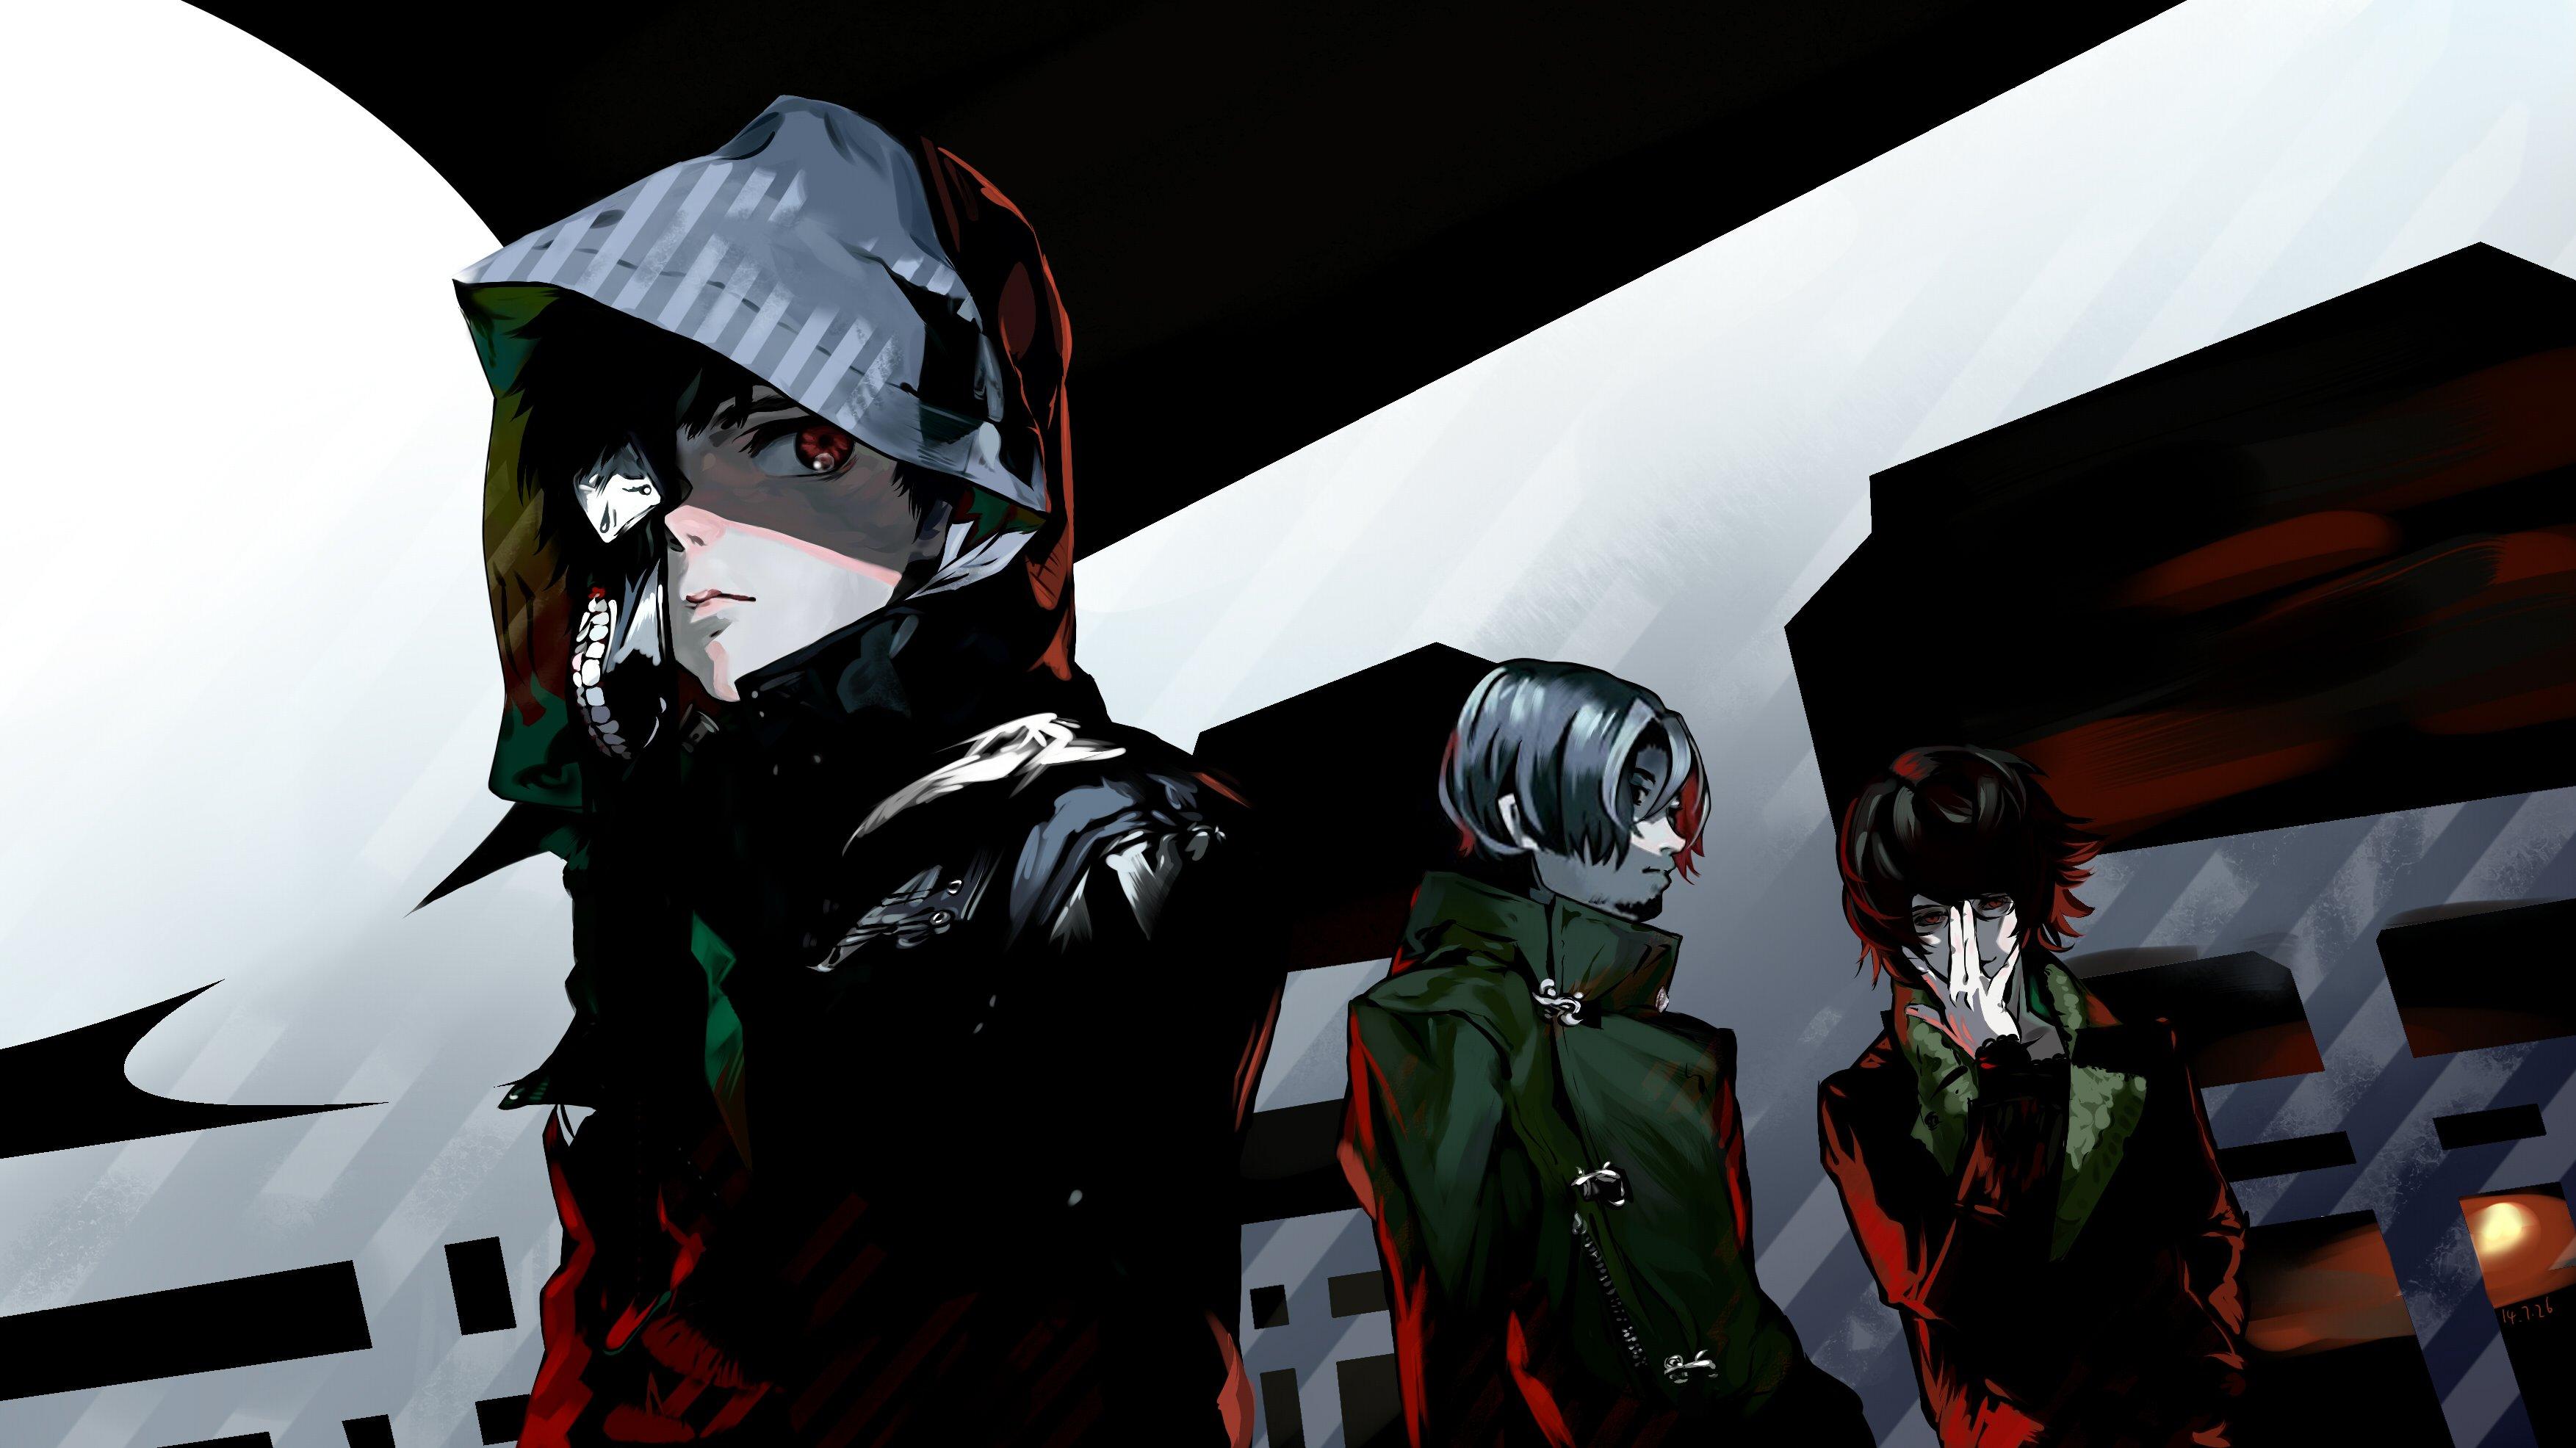 Tokyo ghoul wallpaper | 3507x1972 | 578255 | WallpaperUP